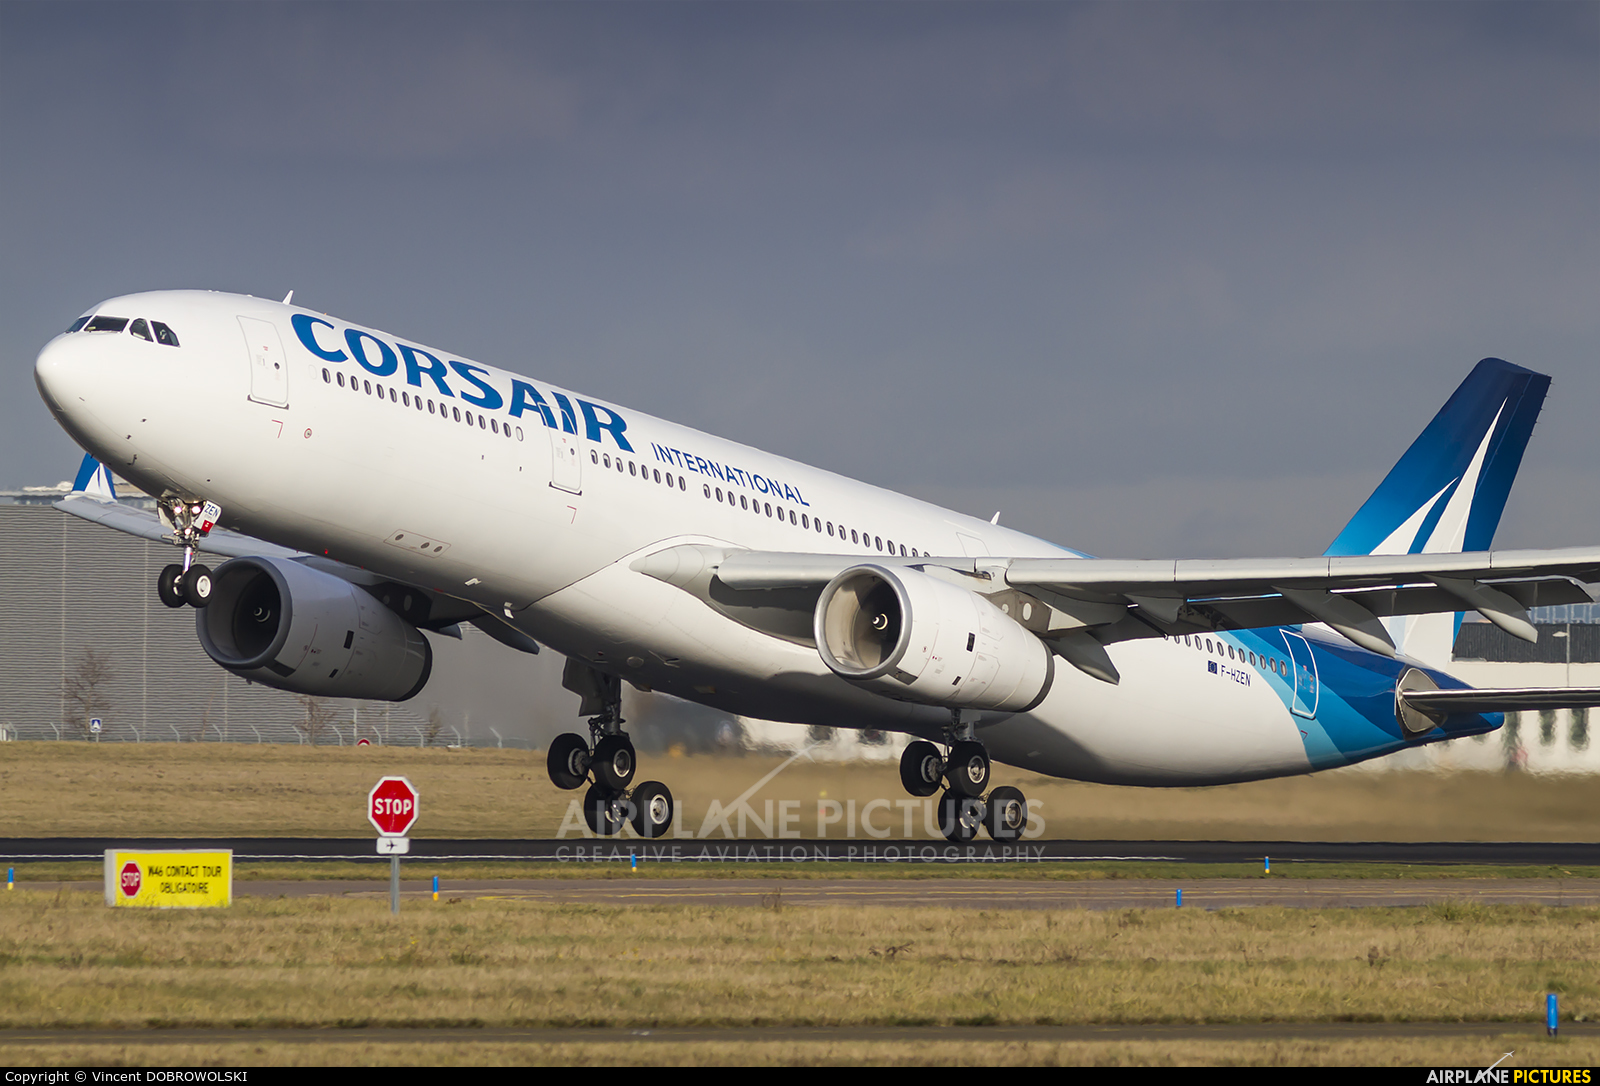 Corsair / Corsair Intl F-HZEN aircraft at Paris - Orly